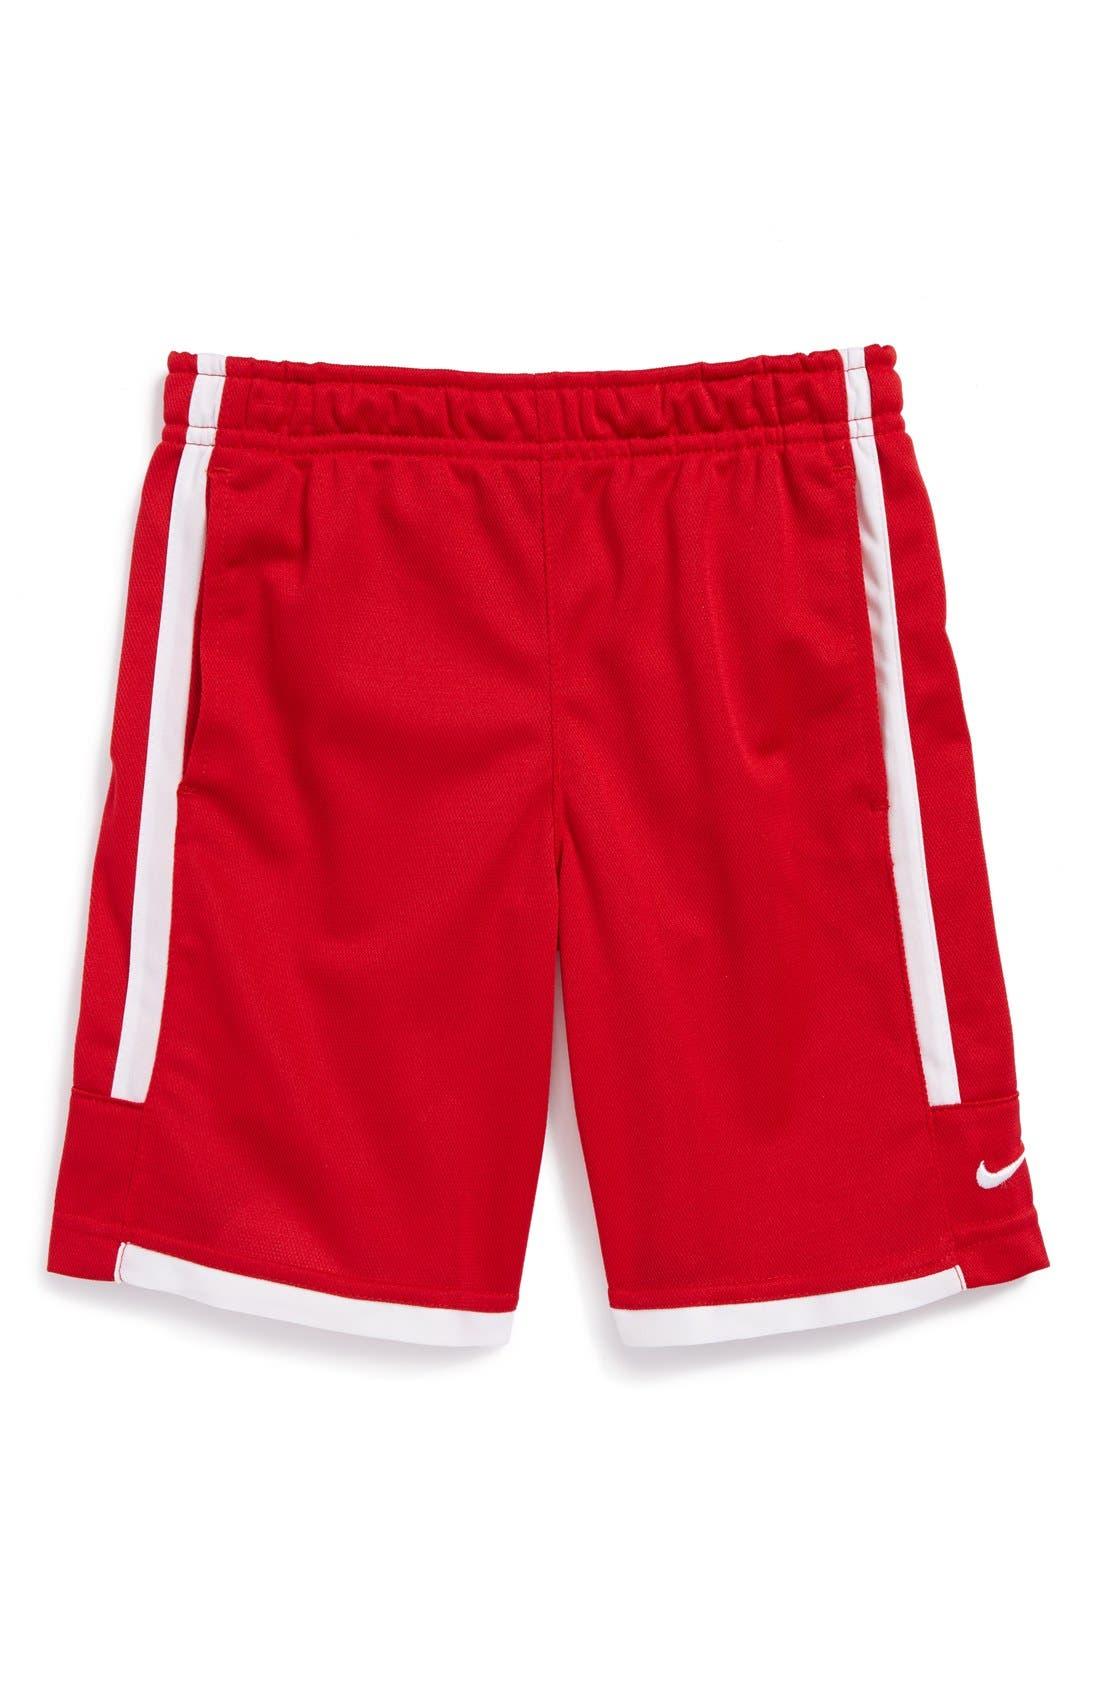 Main Image - Nike 'Double' Dri-FIT Shorts (Little Boys)